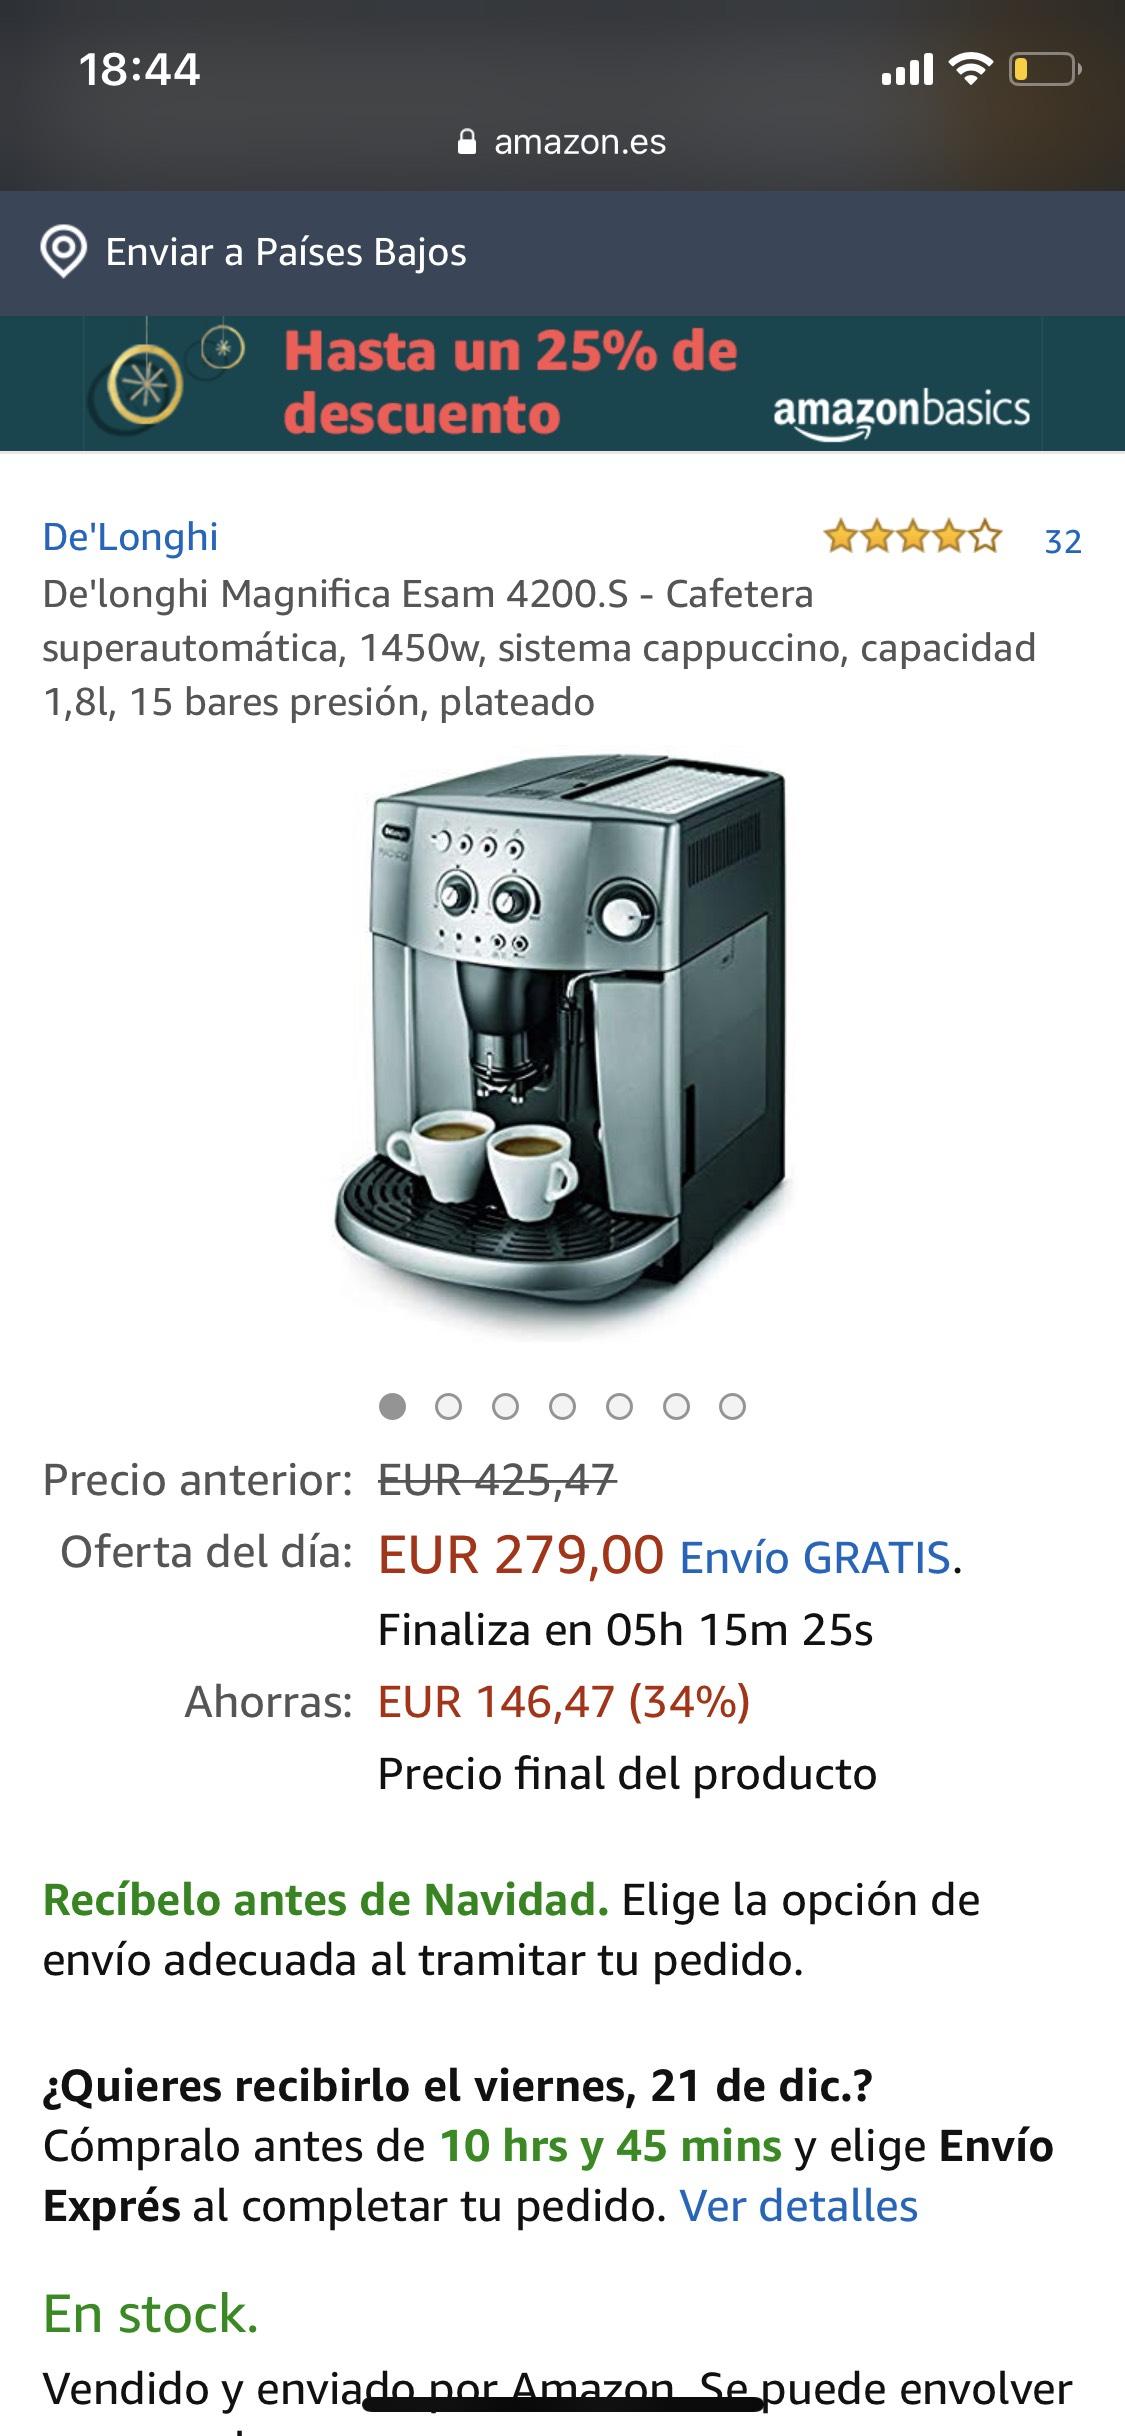 [Espressomaschine] DE'LONGHI ESAM 4200.S AUTOMATISCH